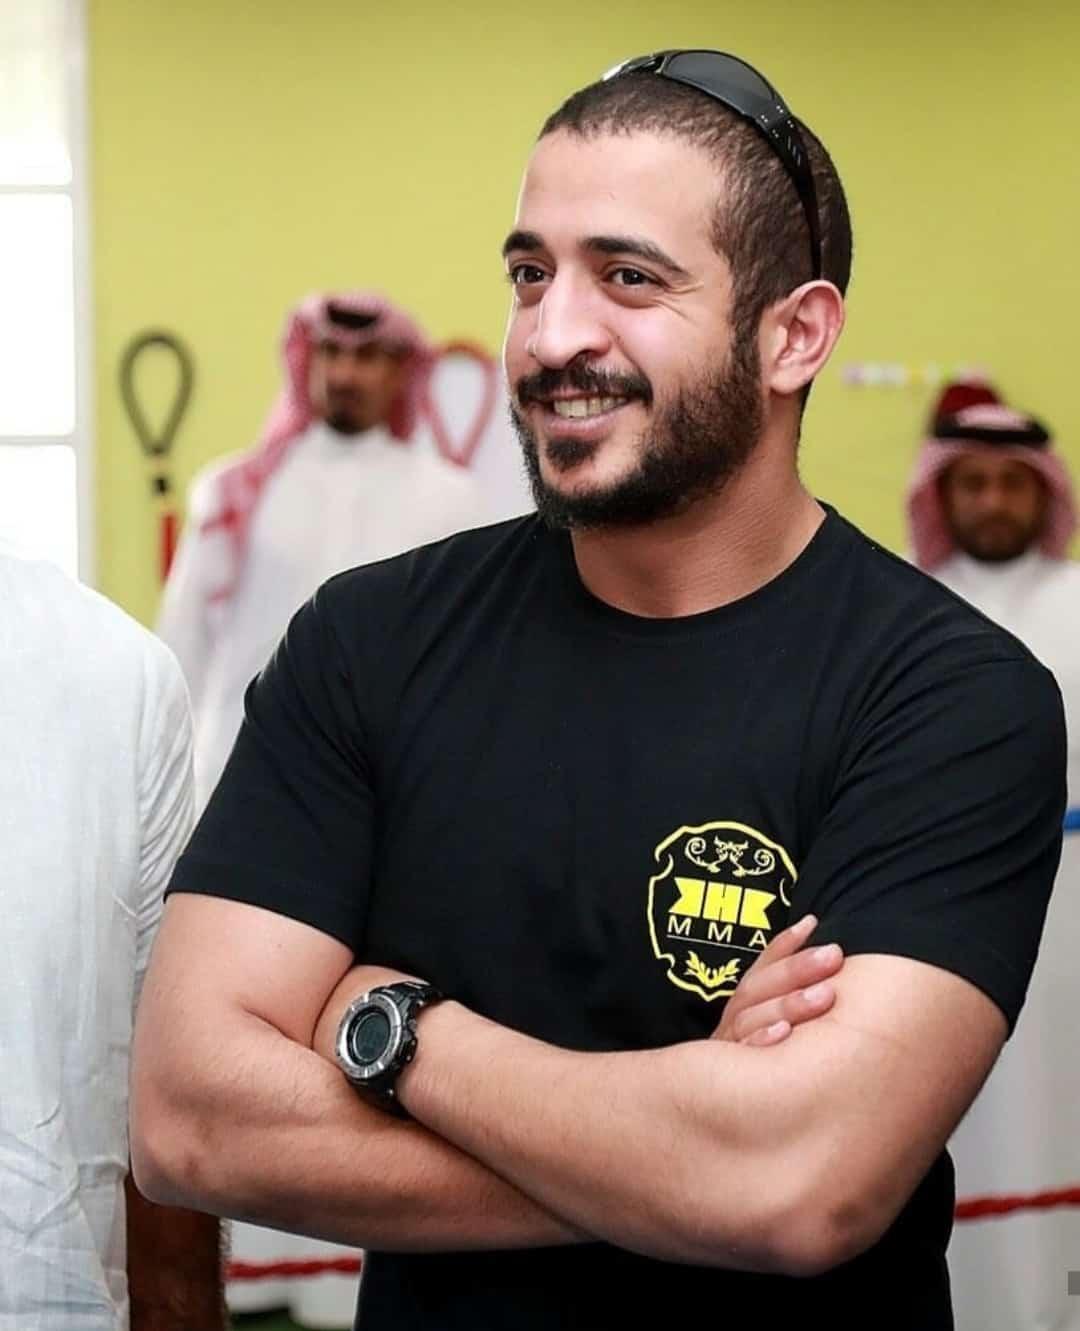 Principe Guerriero del Bahrain: Khalid Bin Hamad Al Khalifa. 5